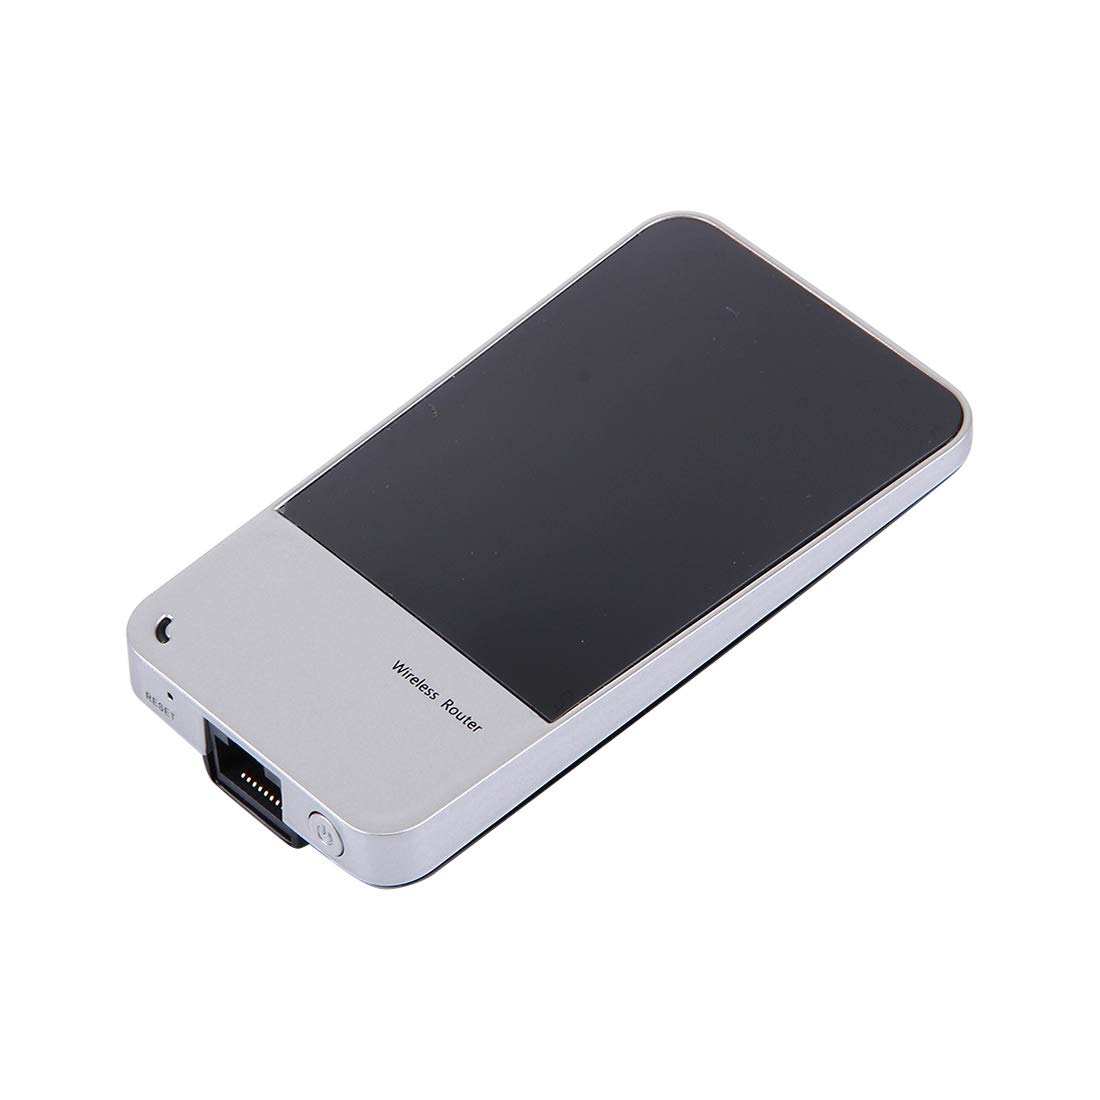 JINYANG Superior L9 3G 150Mbps Wireless WiFi Modem